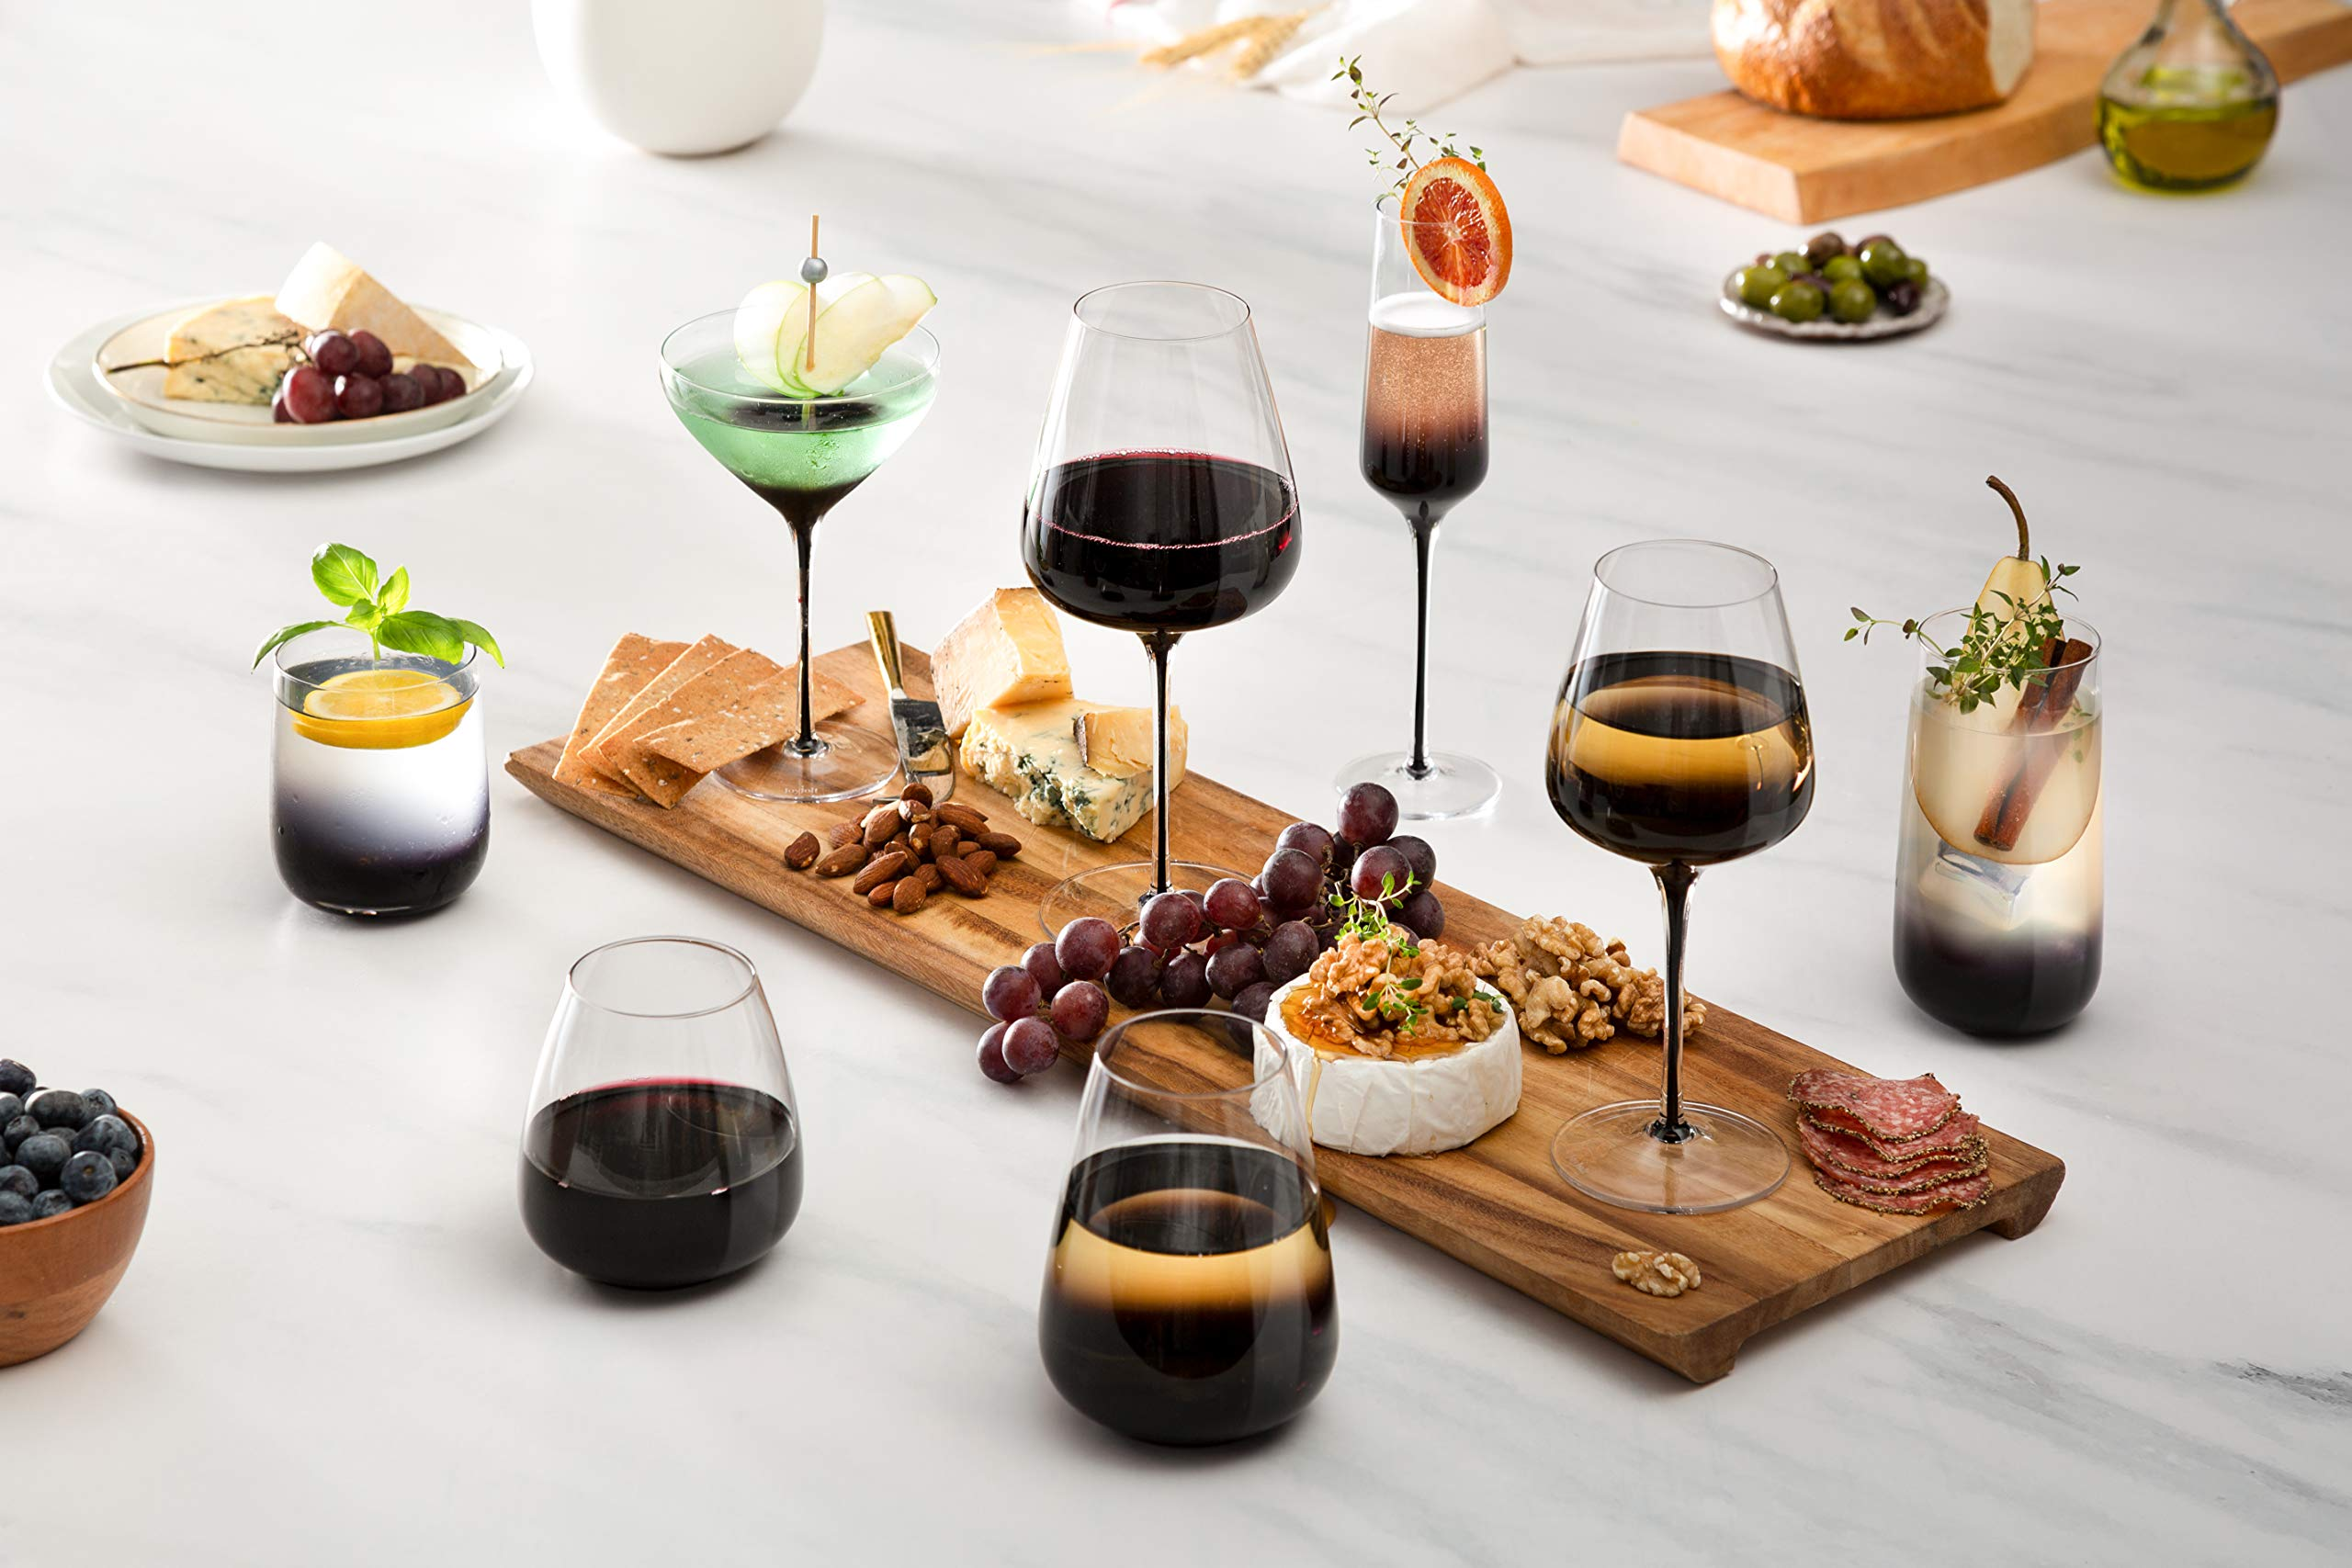 JoyJolt Black Swan Stemmed Martini Glasses, Premium Lead Free Crystal Glassware, 10.5 Oz Capacity, Set Of 2 by JoyJolt (Image #6)